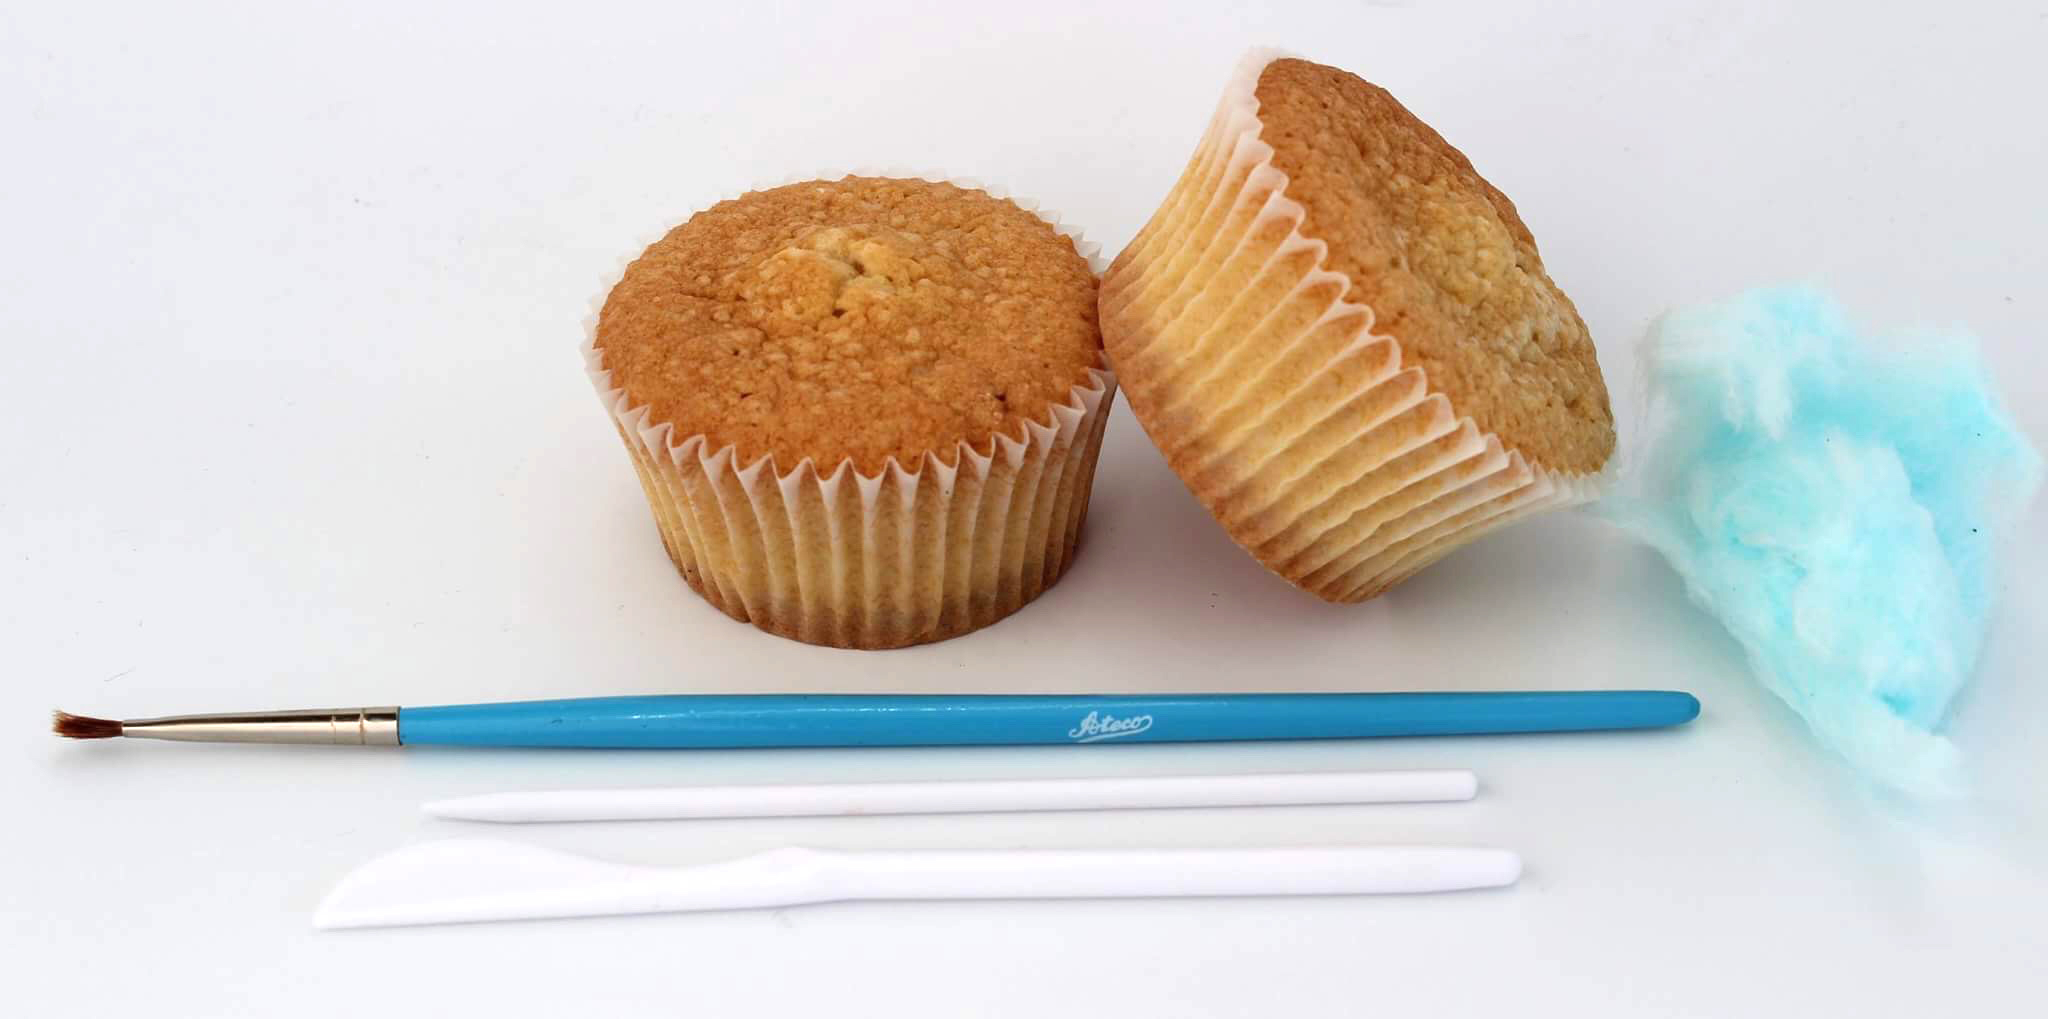 sff17_CrabTutorial-Monique-Ascanelli-The-Cake-Topper-Tools2.JPG#asset:17079